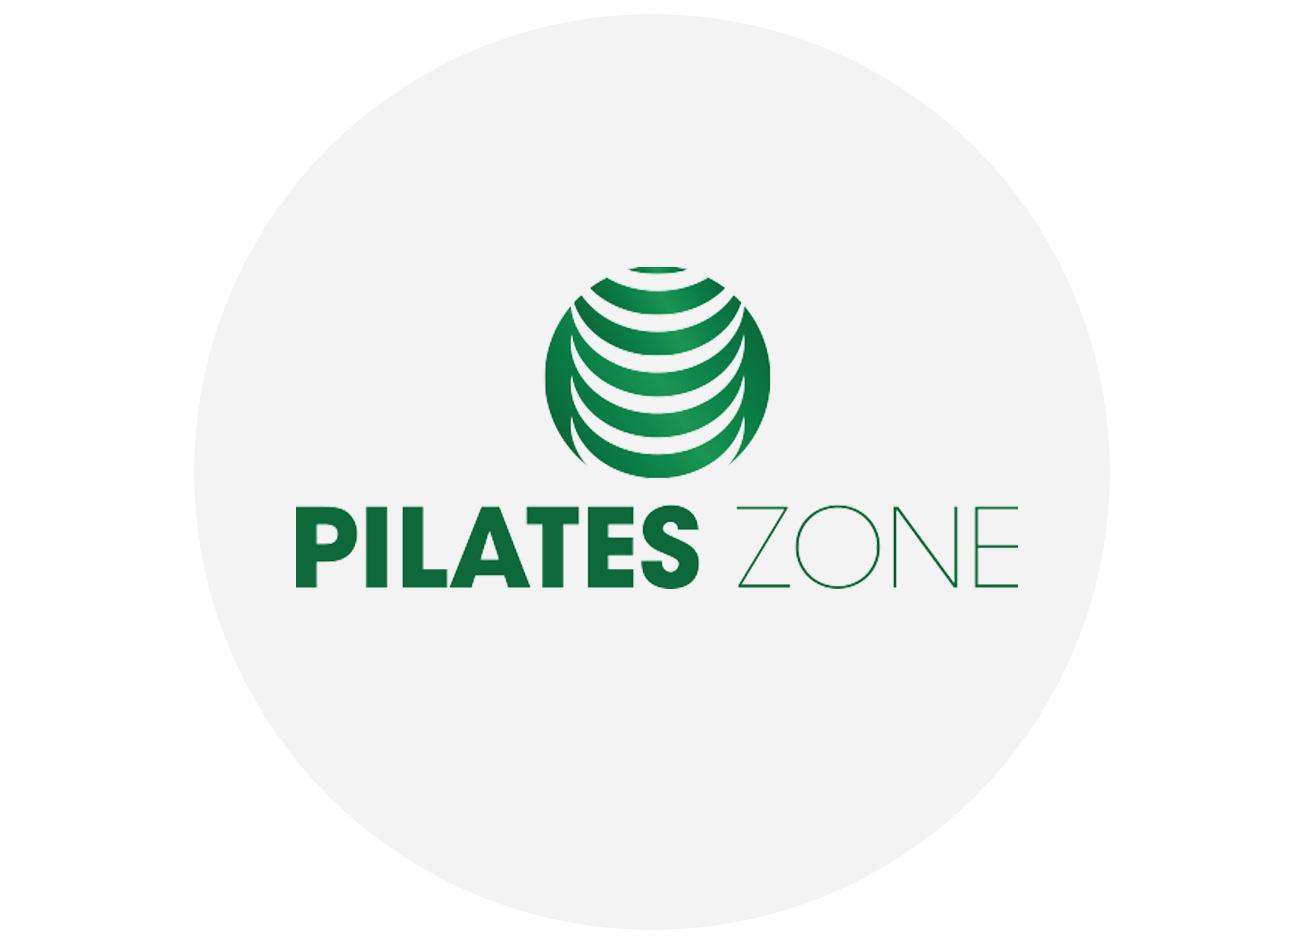 Pilates-Zone-2.jpg